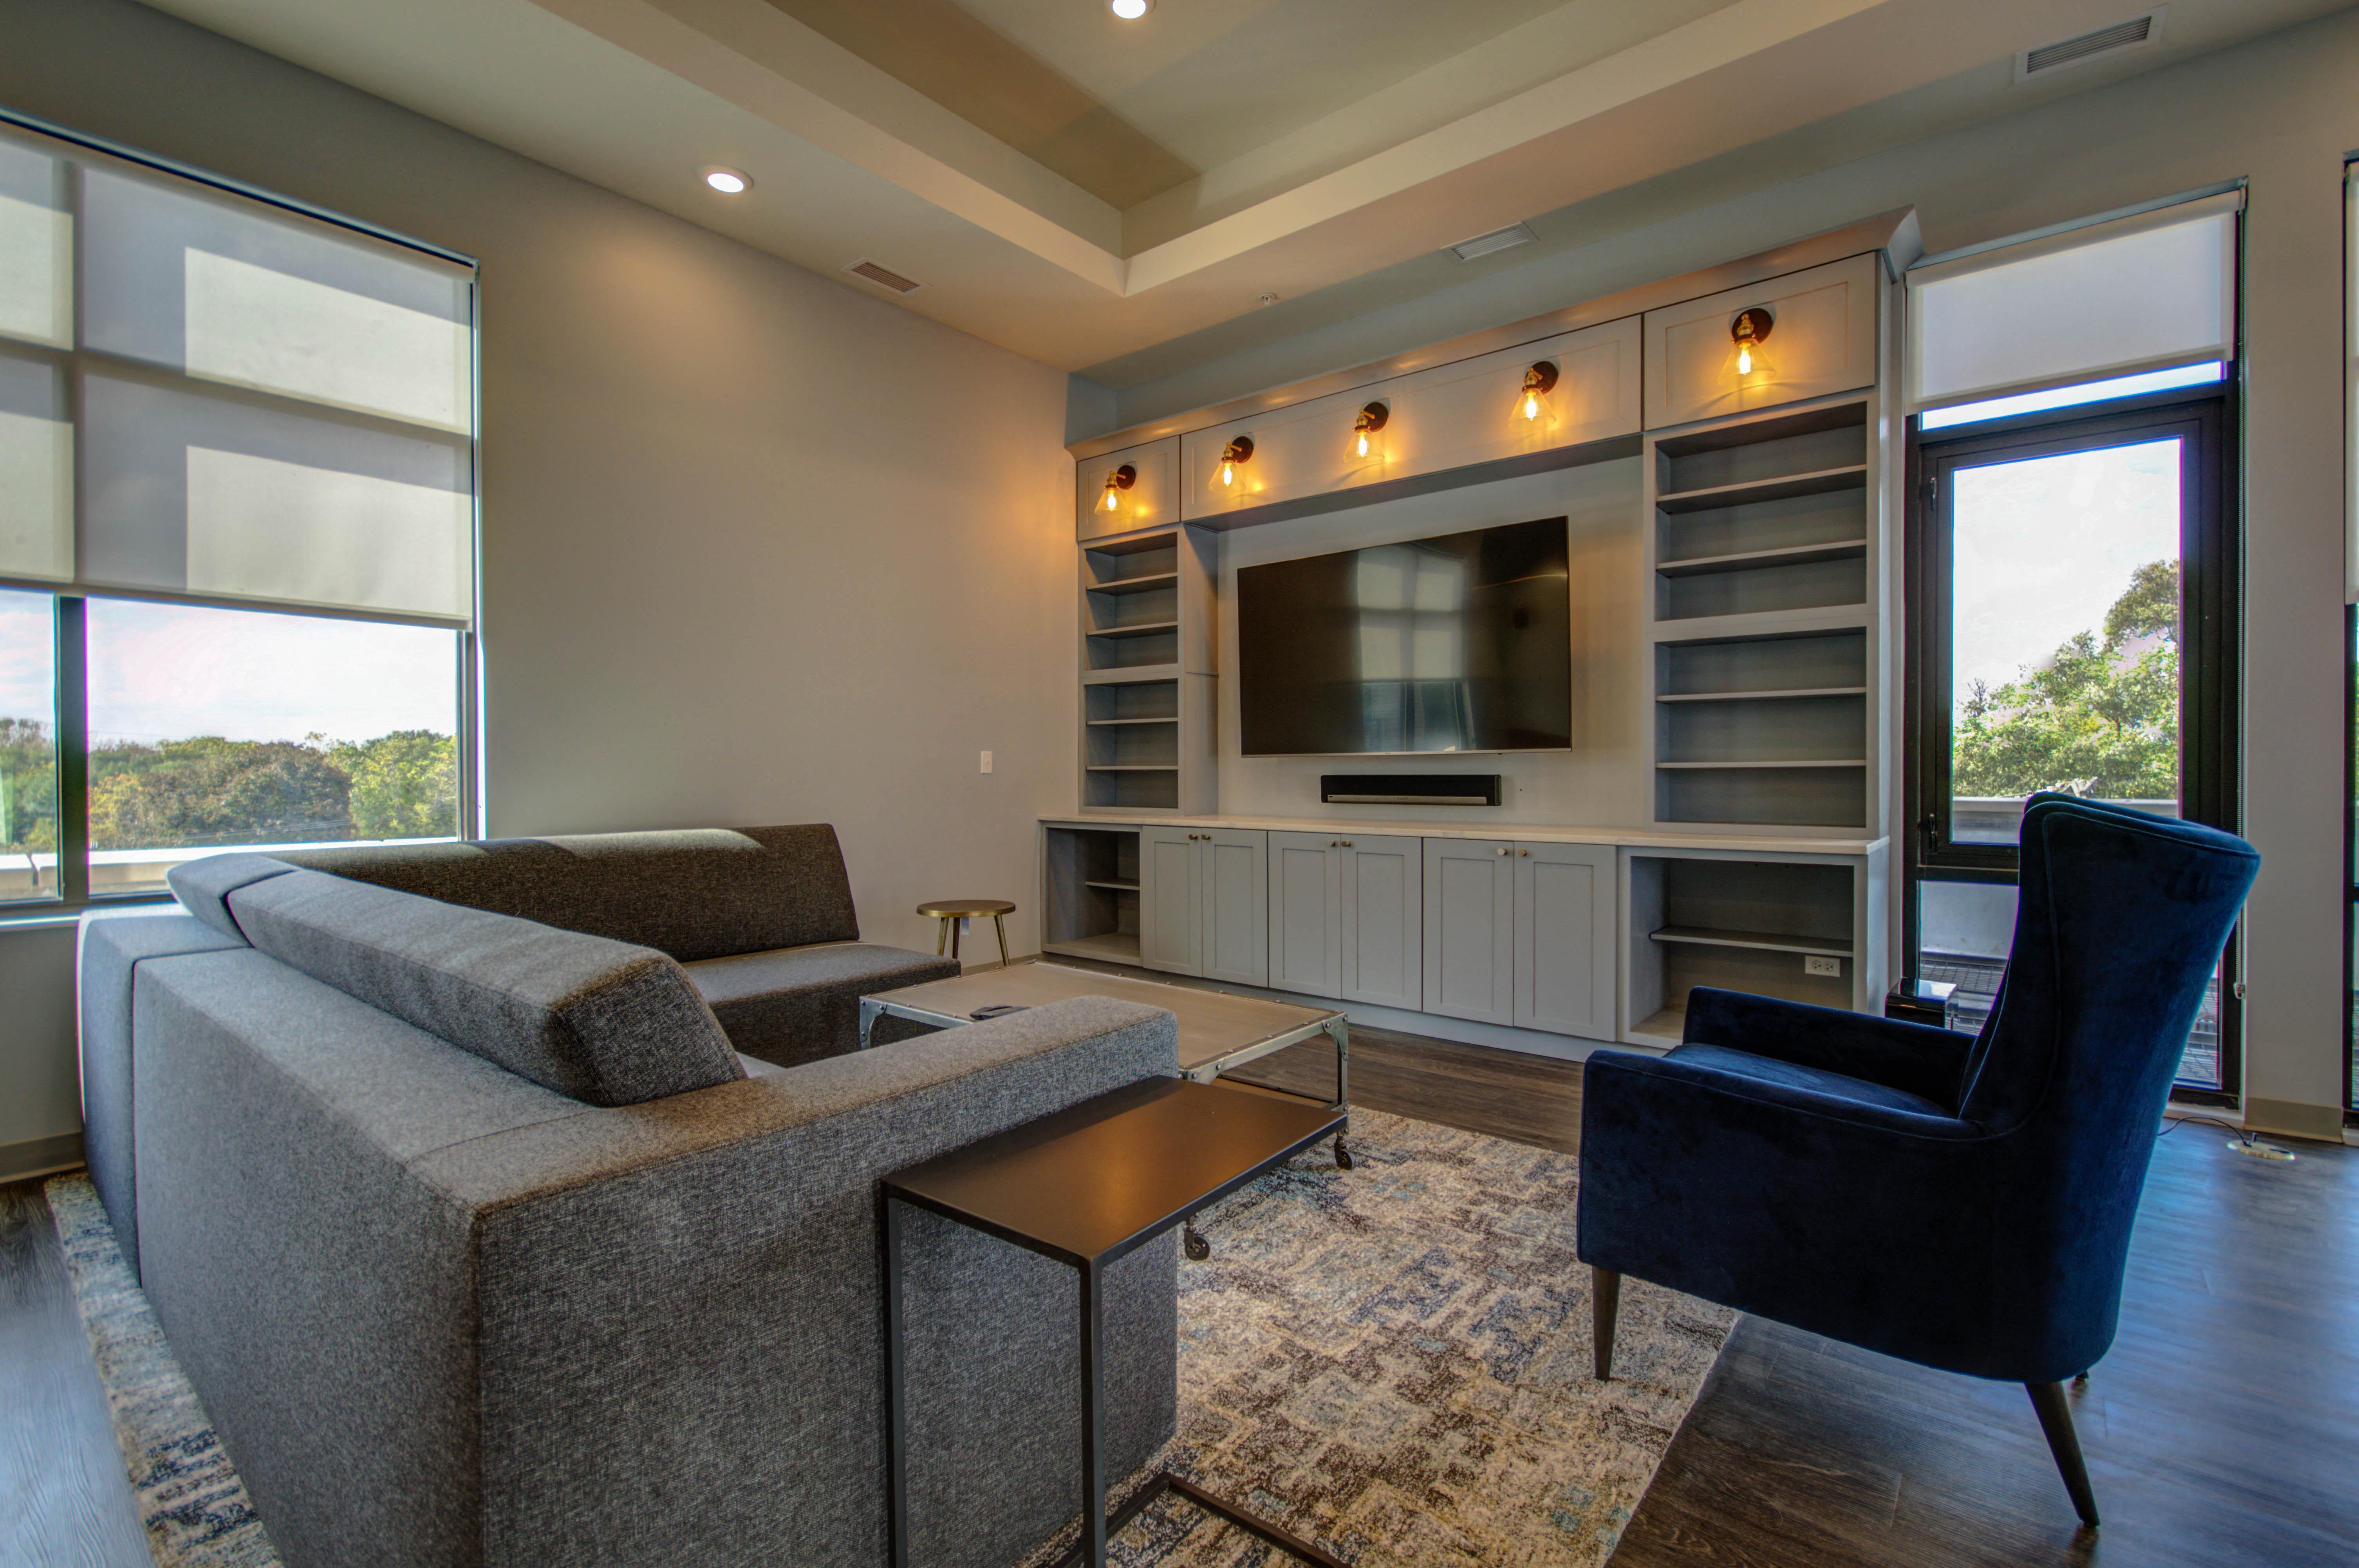 101 W. Liberty St., Barrington, IL 60010, 2 Bedroom's, 2 Bathroom's, Lake County, Illinois, Apartment for Rent